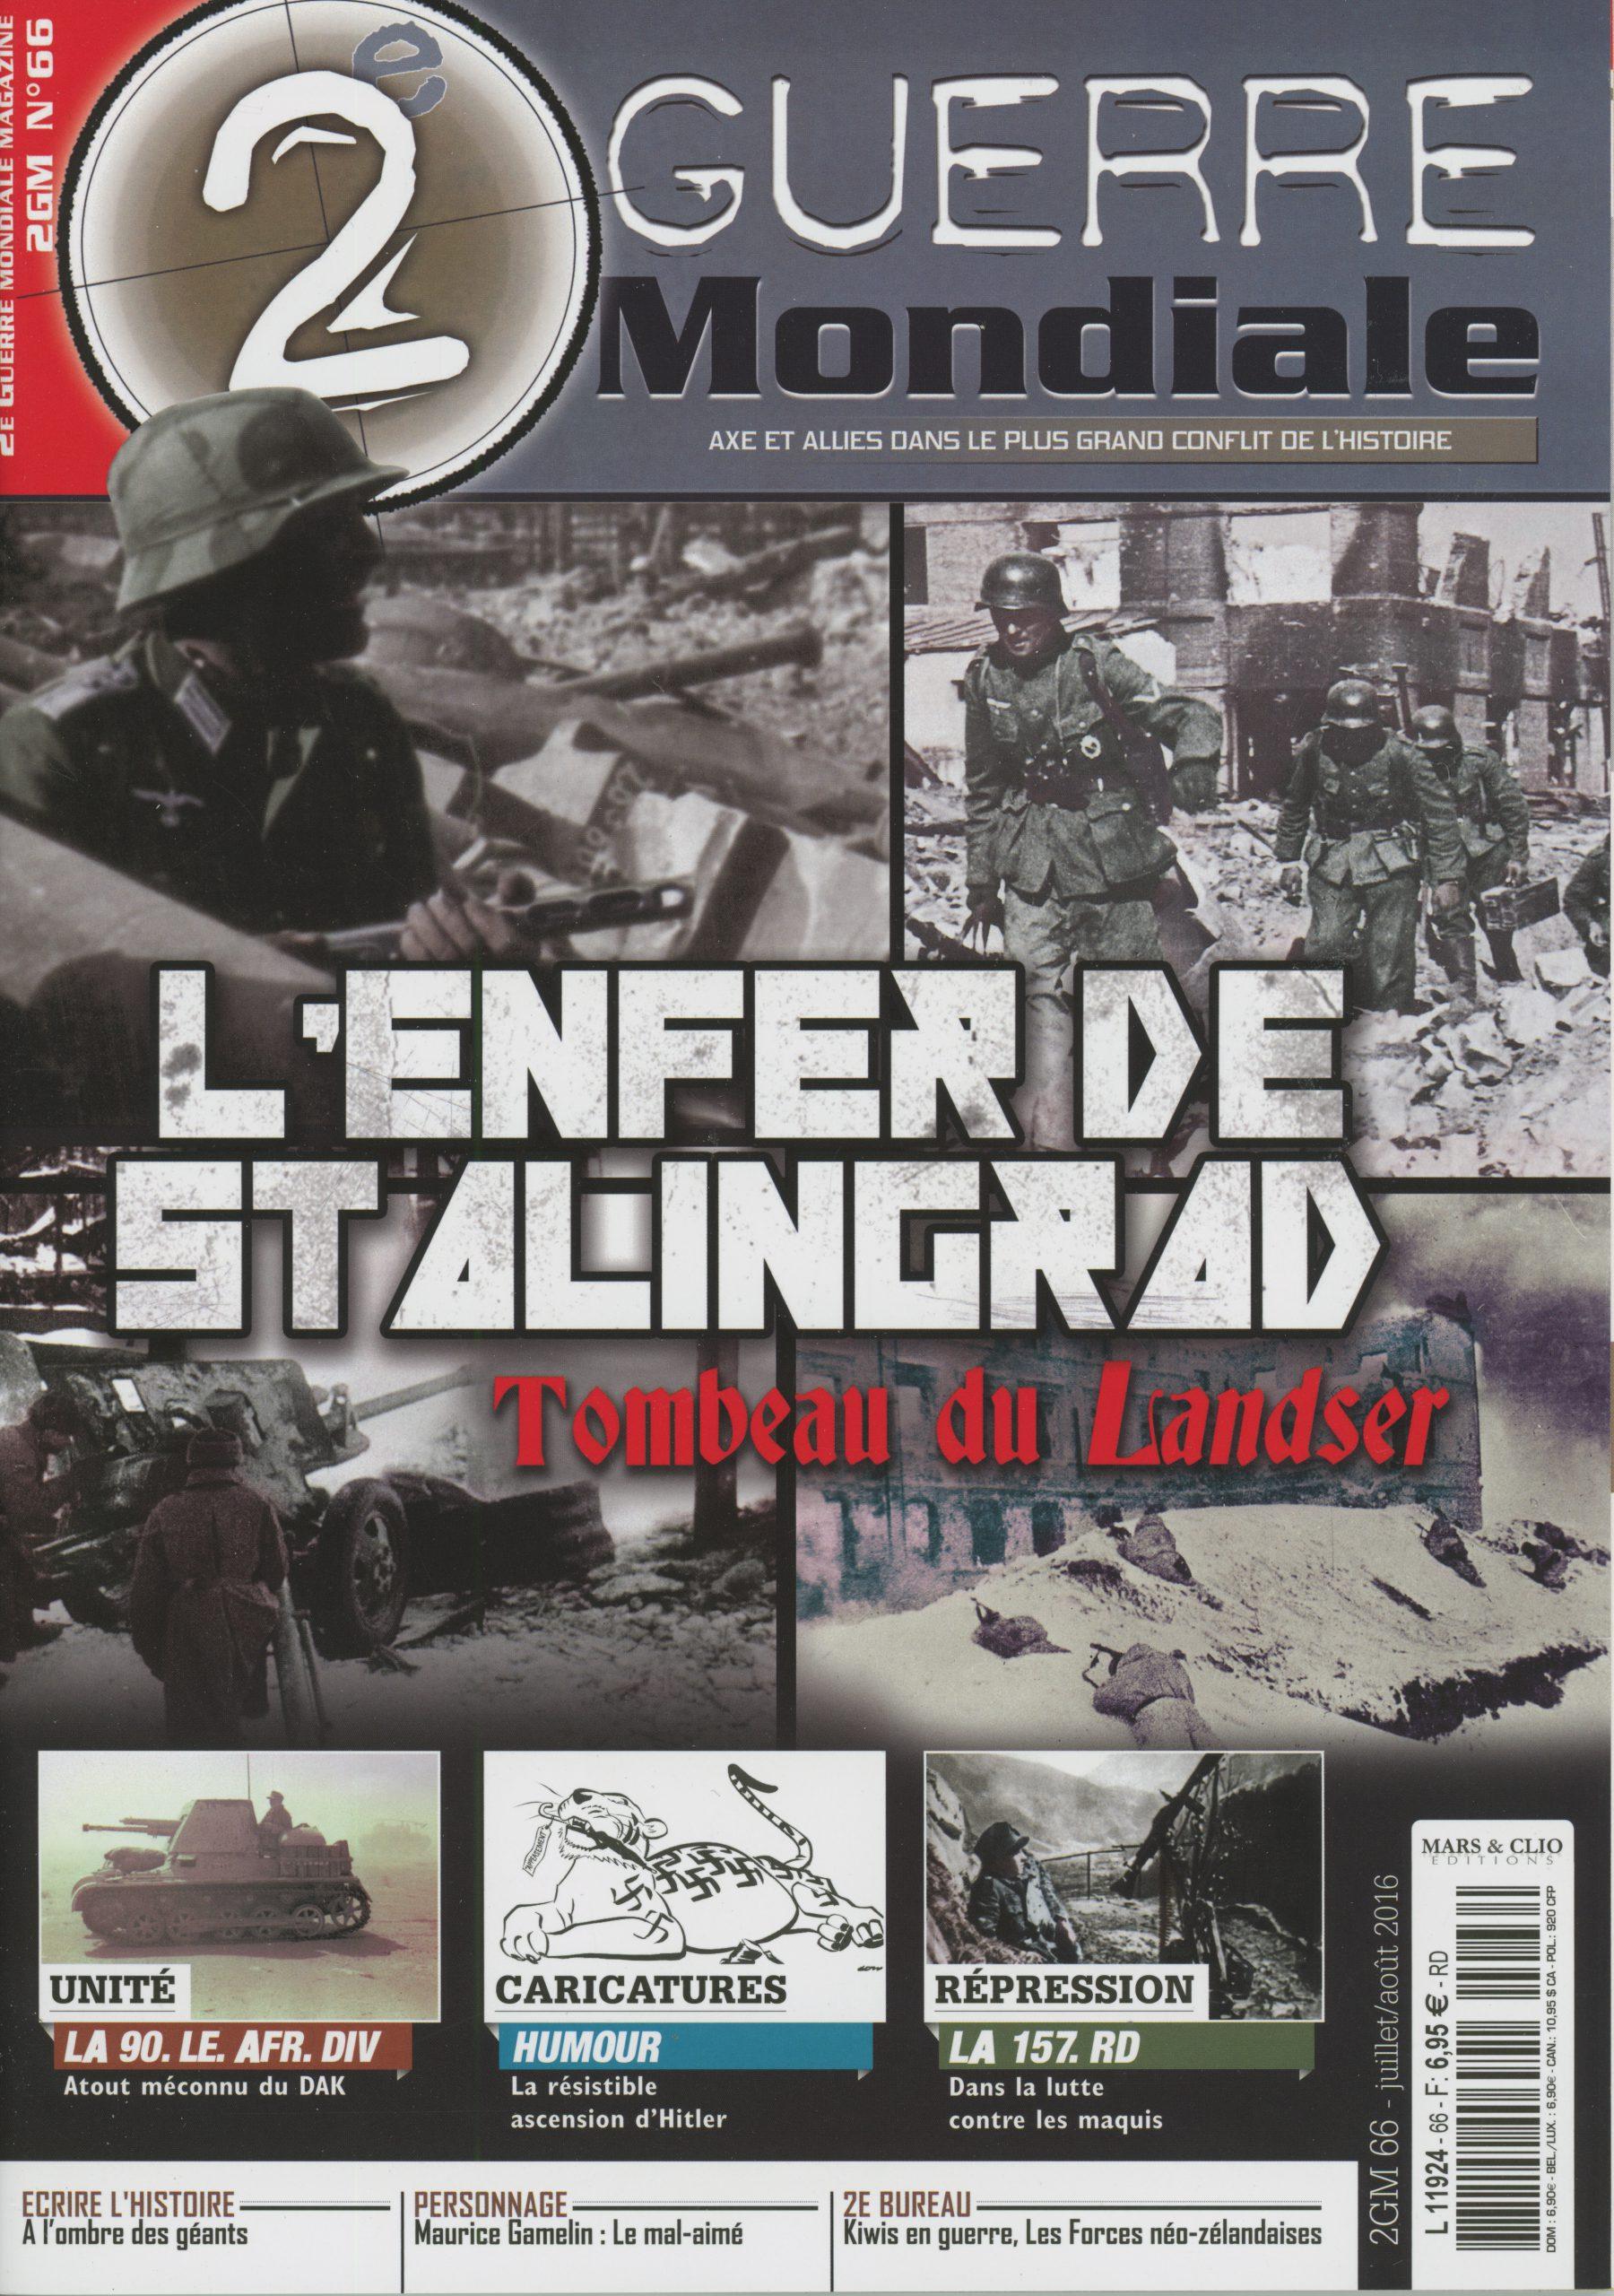 2GM magazine n° 66